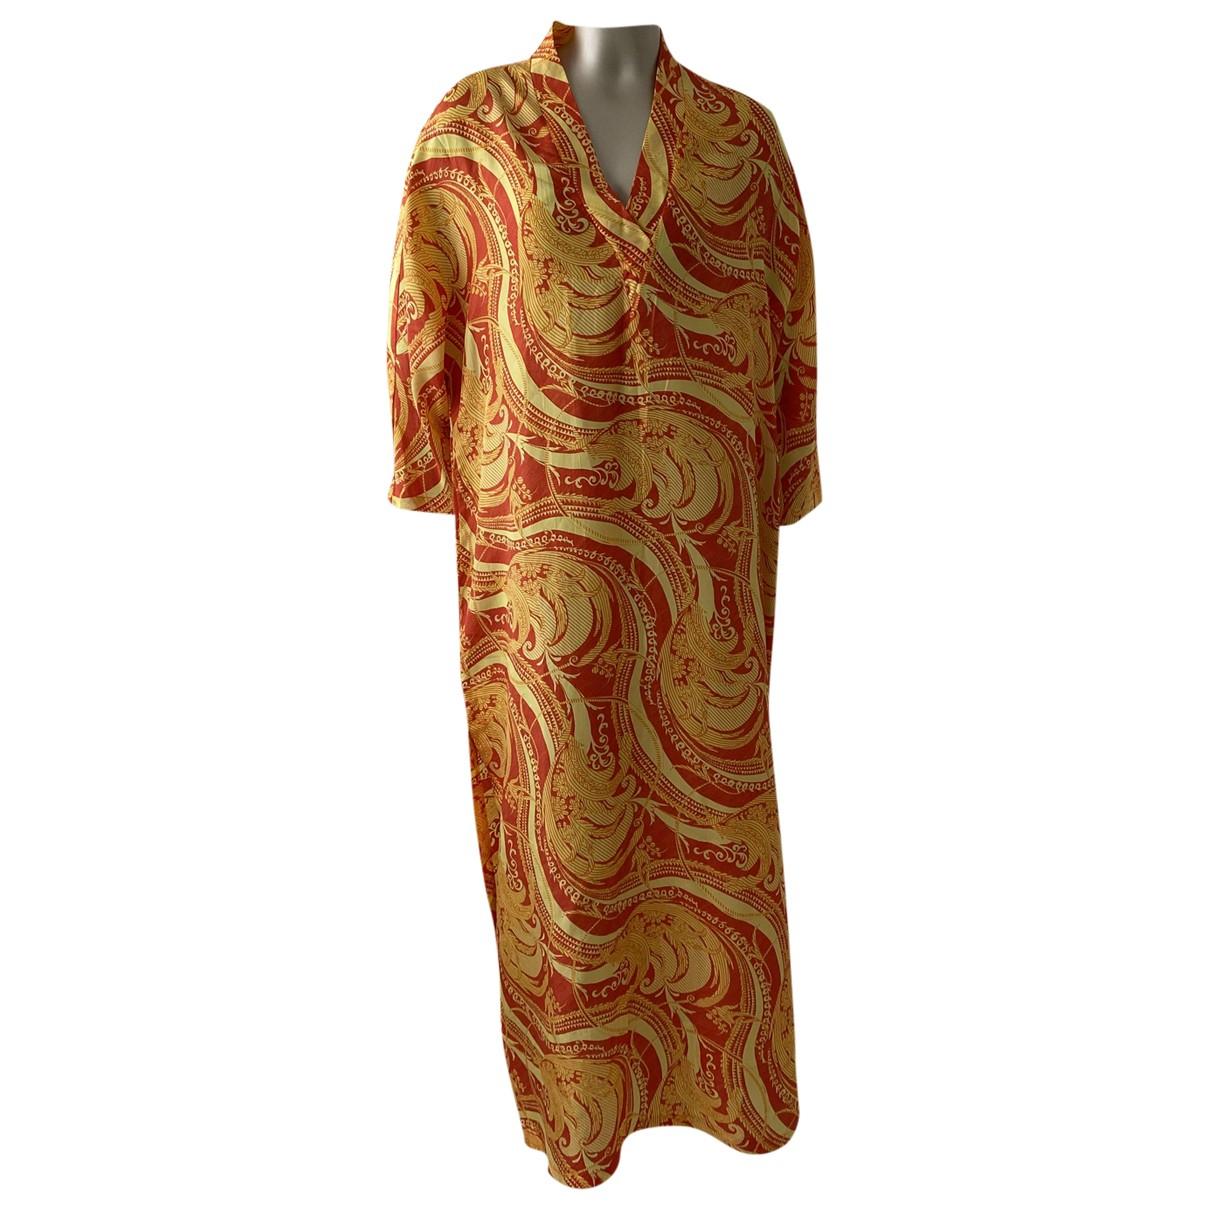 Gianfranco Ferre - Robe   pour femme en soie - orange